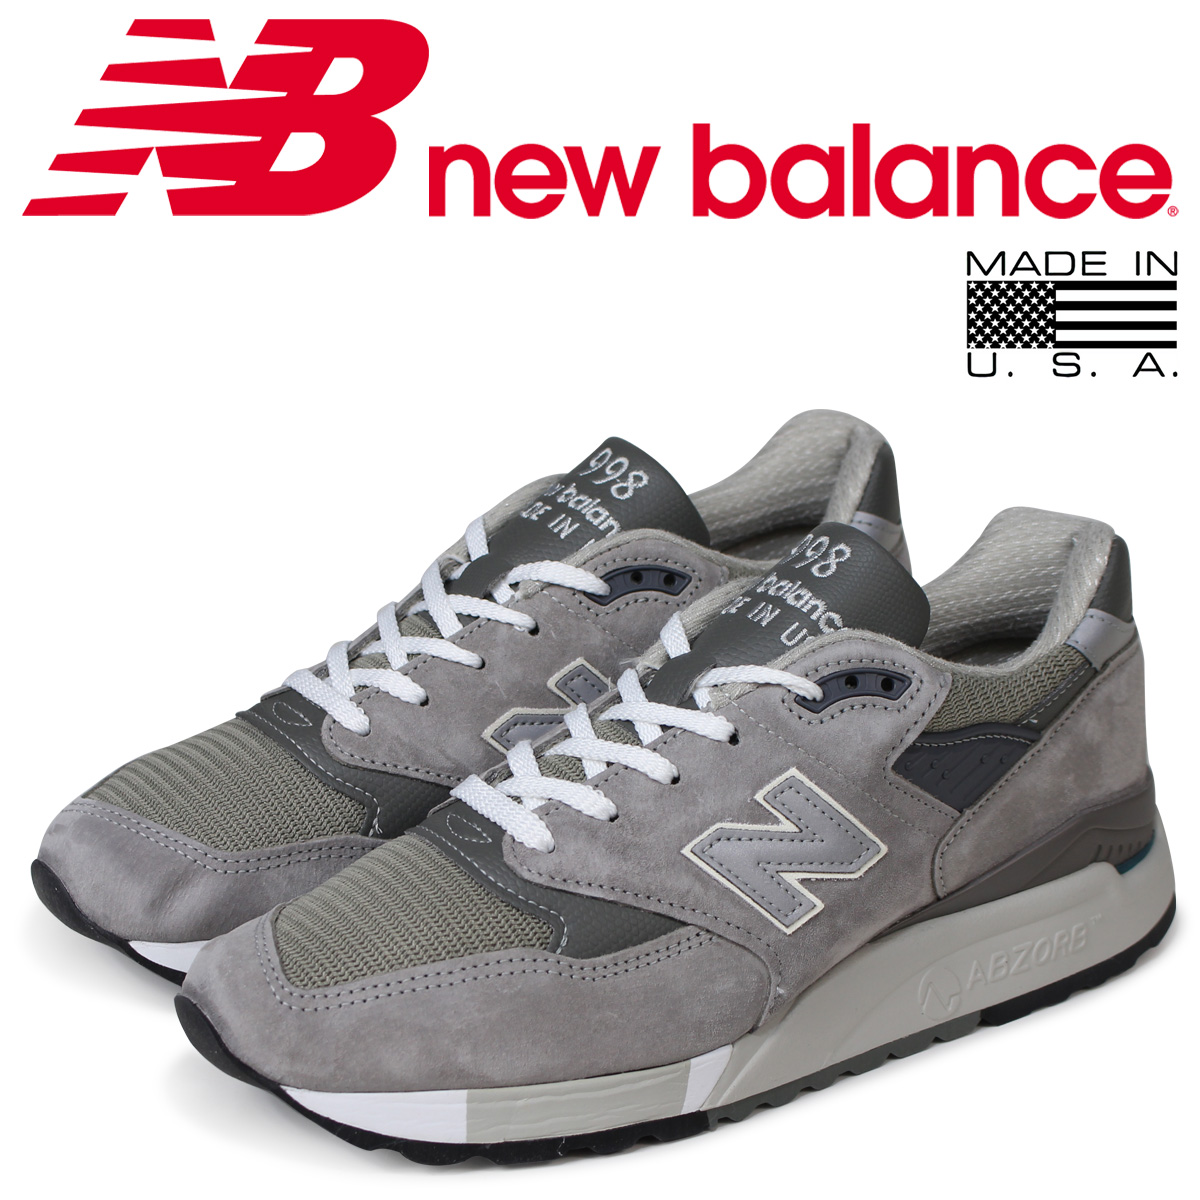 new balance ニューバランス スニーカー M998 GY MADE IN USA Dワイズ メンズ 靴 グレー